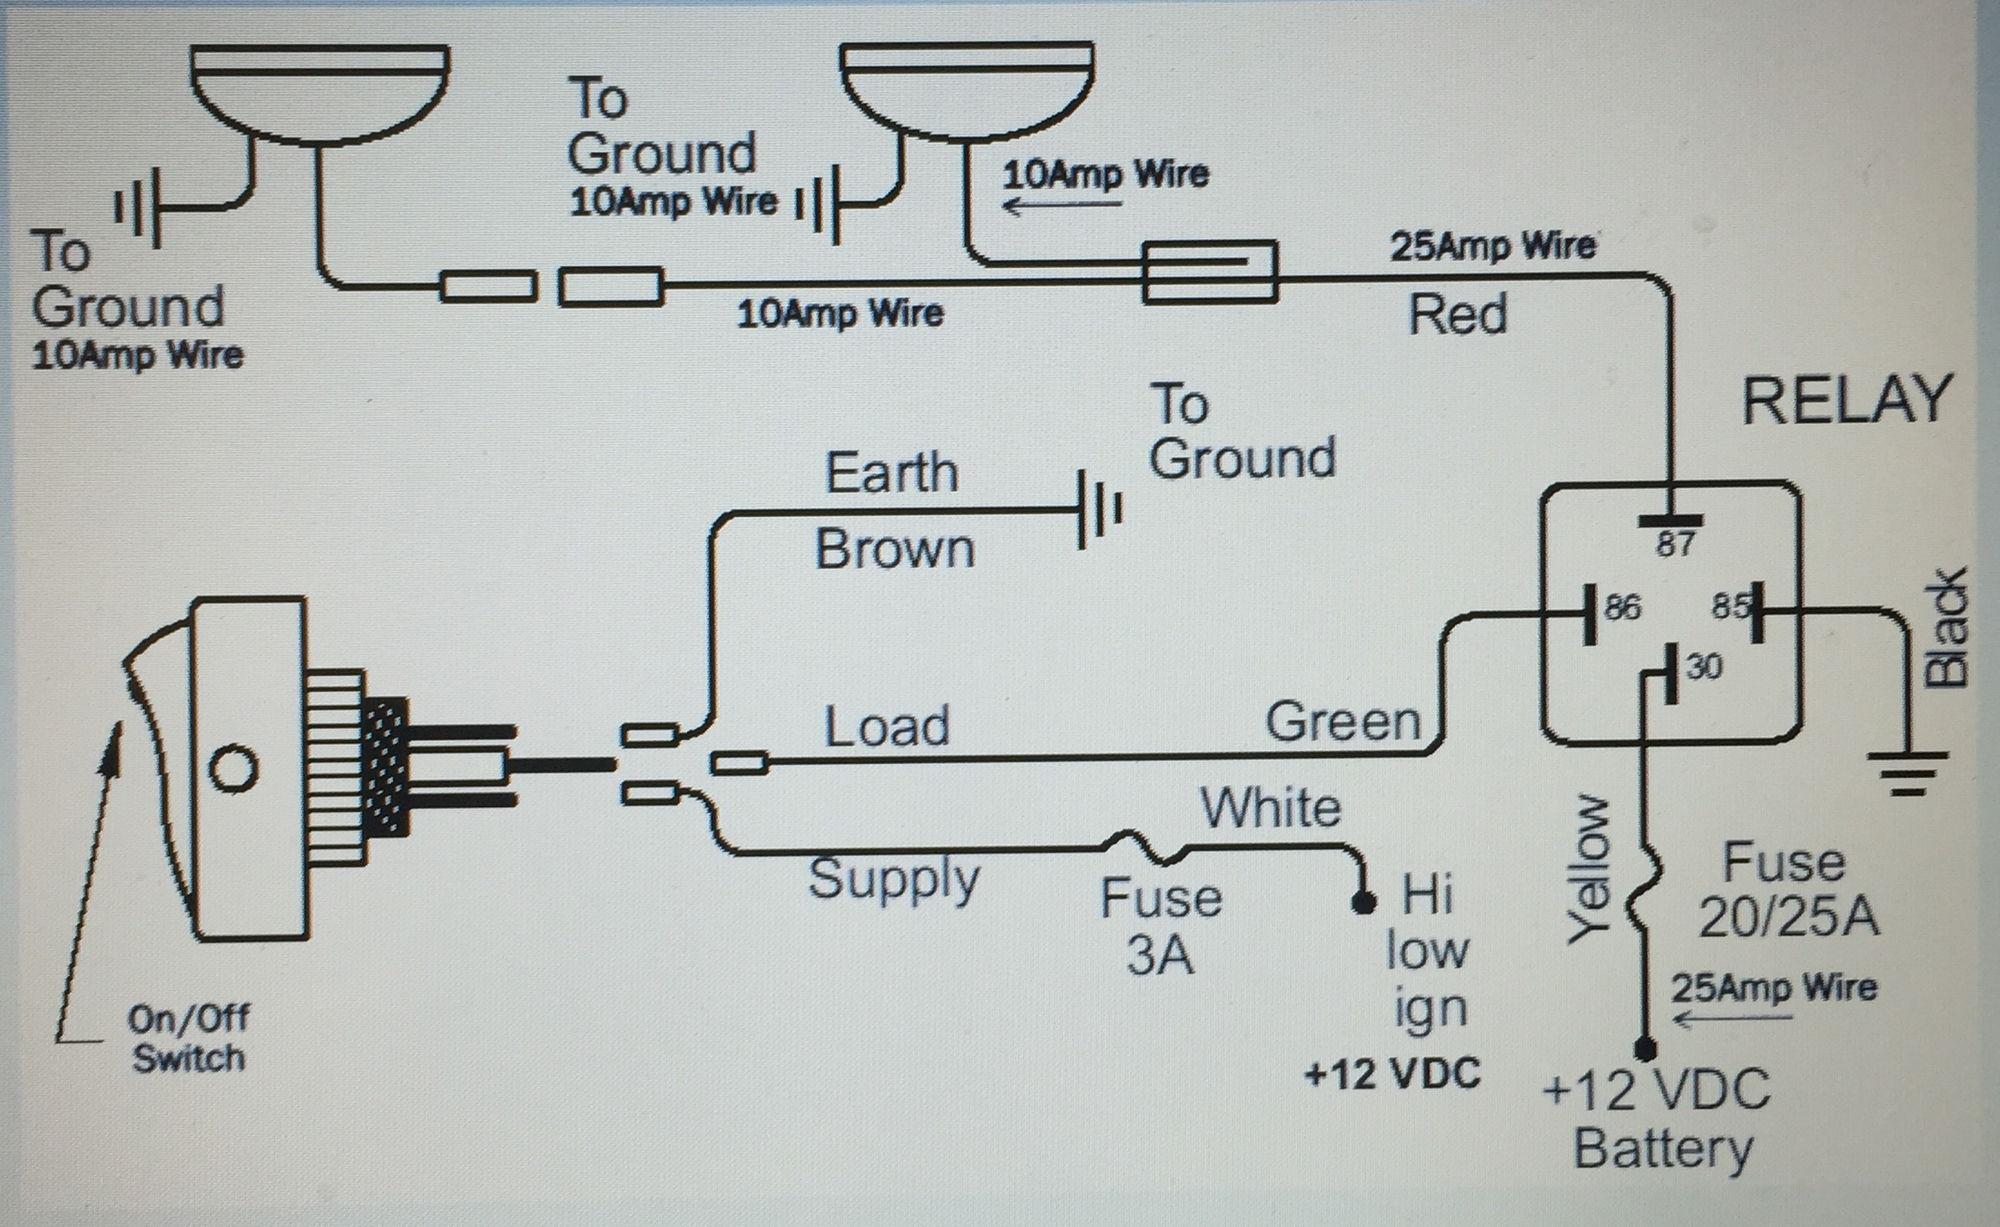 80 image_c5e9ecfc41c997308e74ea1915bb479cc9b83ccc?resize=665%2C408&ssl=1 rigid industries light bar wiring diagram wiring diagram rigid industries switch wiring diagram at gsmportal.co